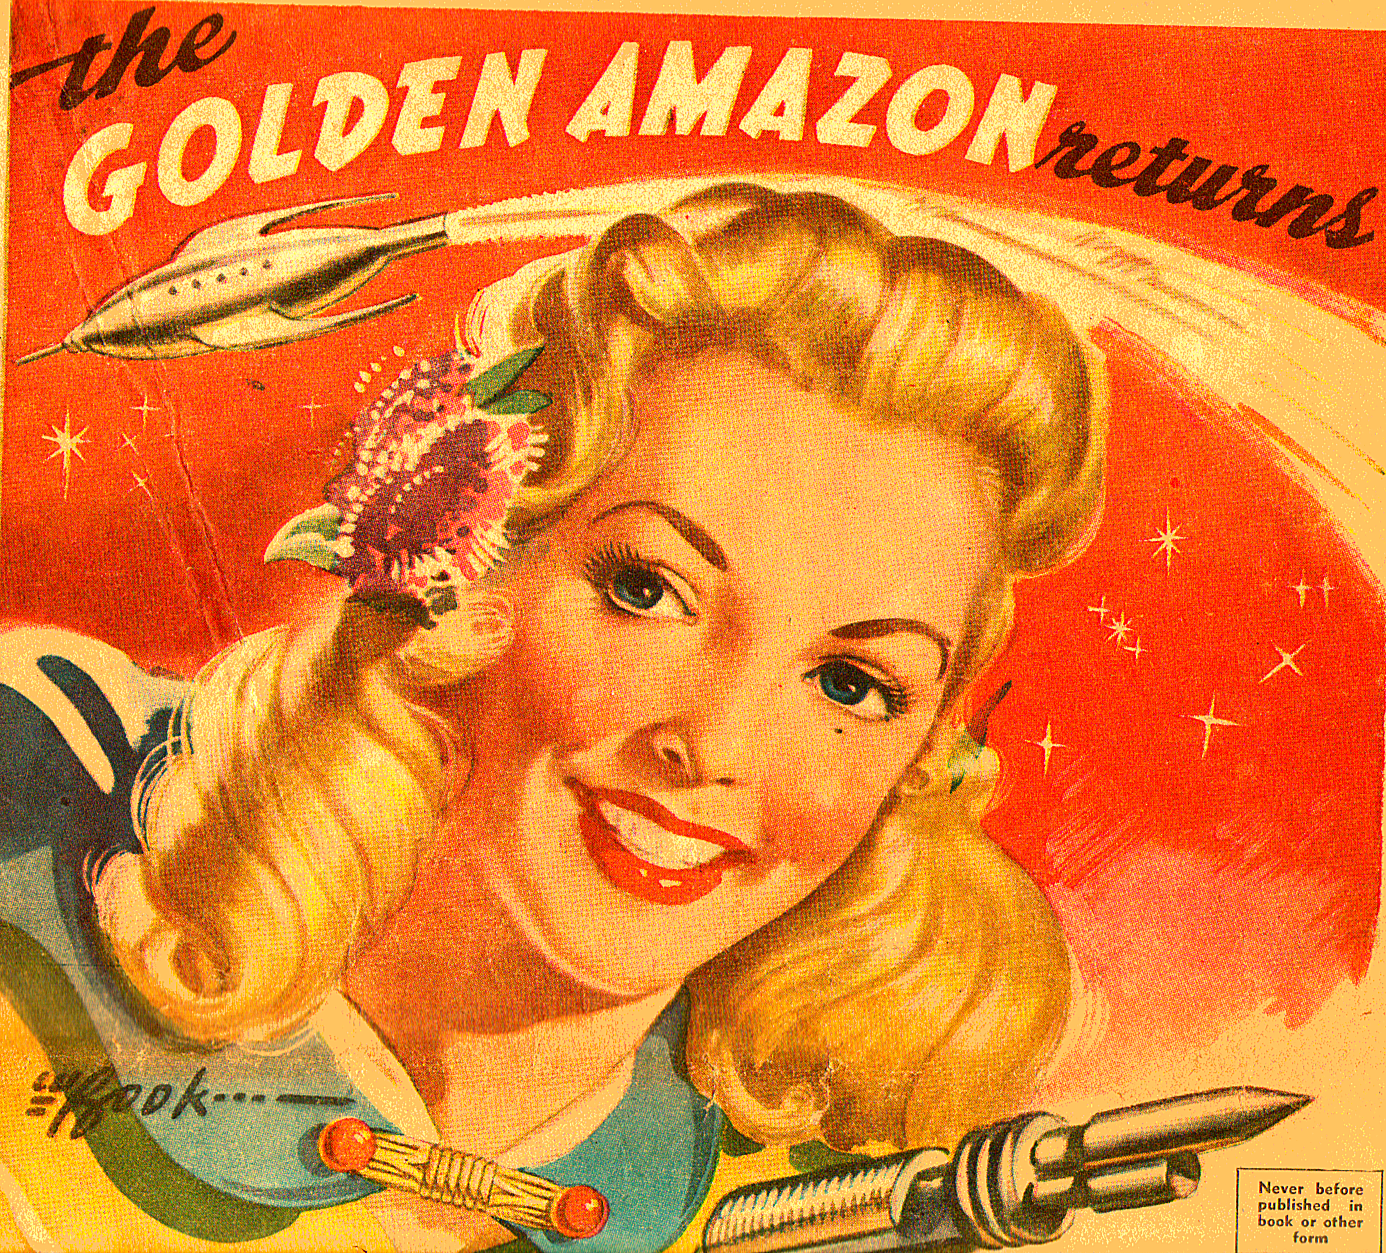 RG Cameron March 7 2014 illo #1 'Amazon Returns'